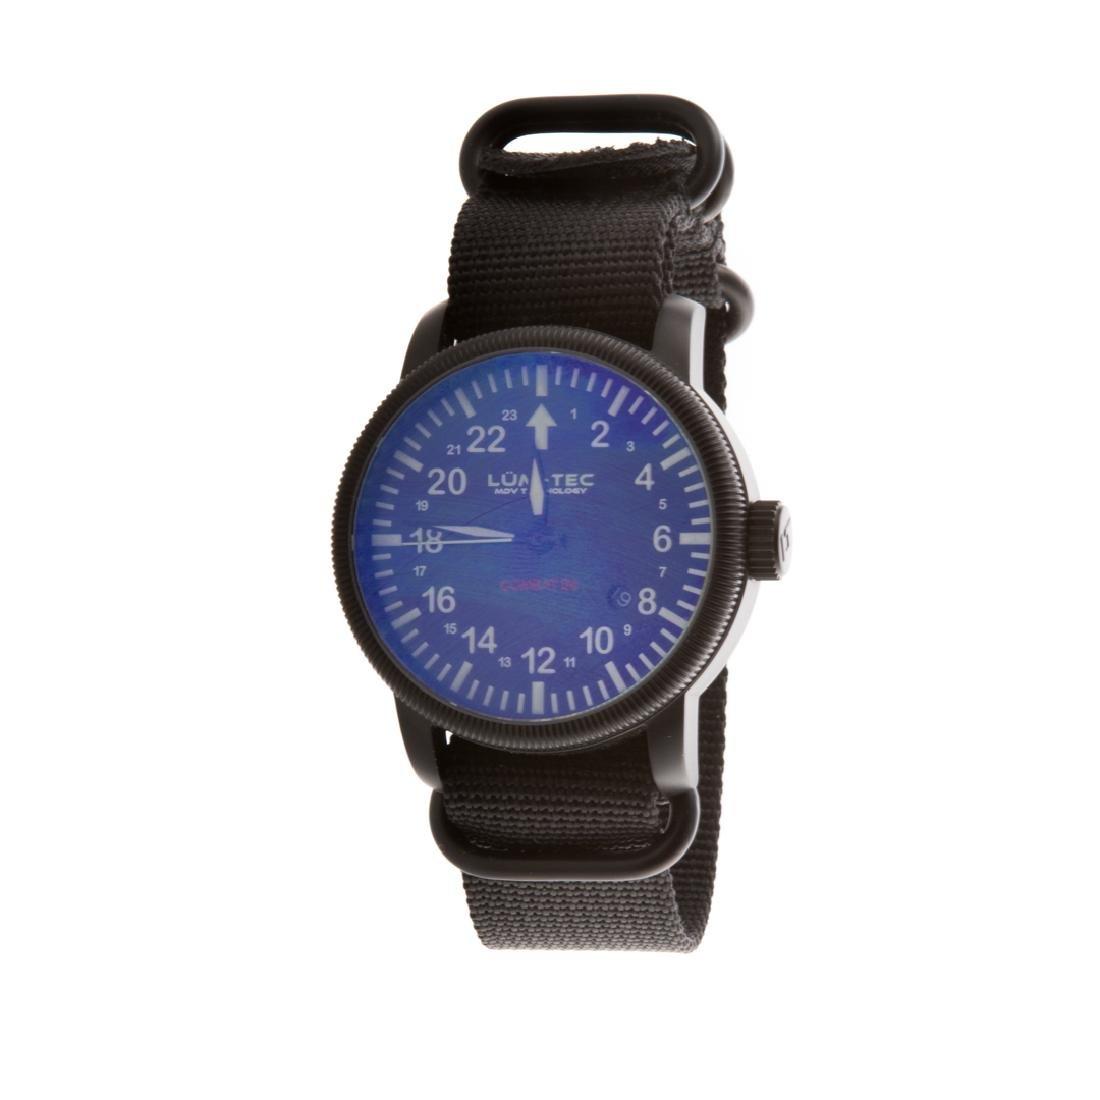 A Gent's Lum-Tec Combat B4 Wrist Watch